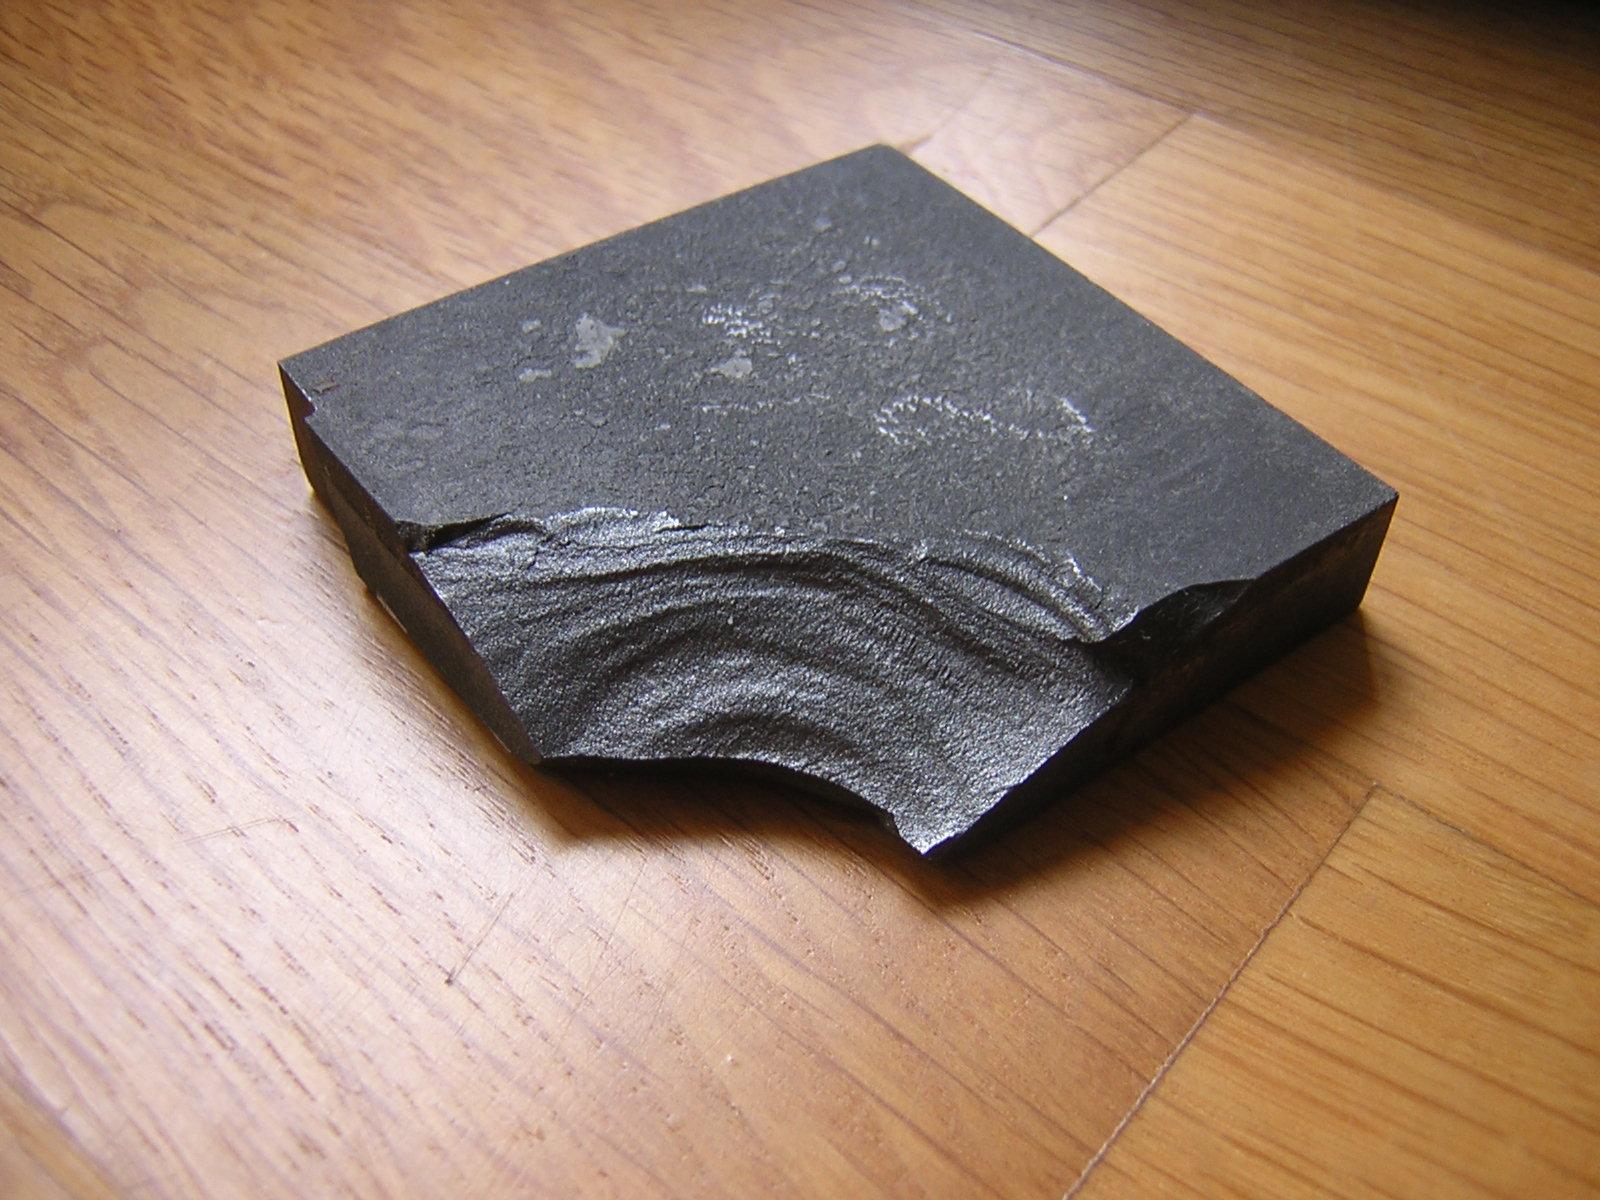 Boron carbide - Wikipedia